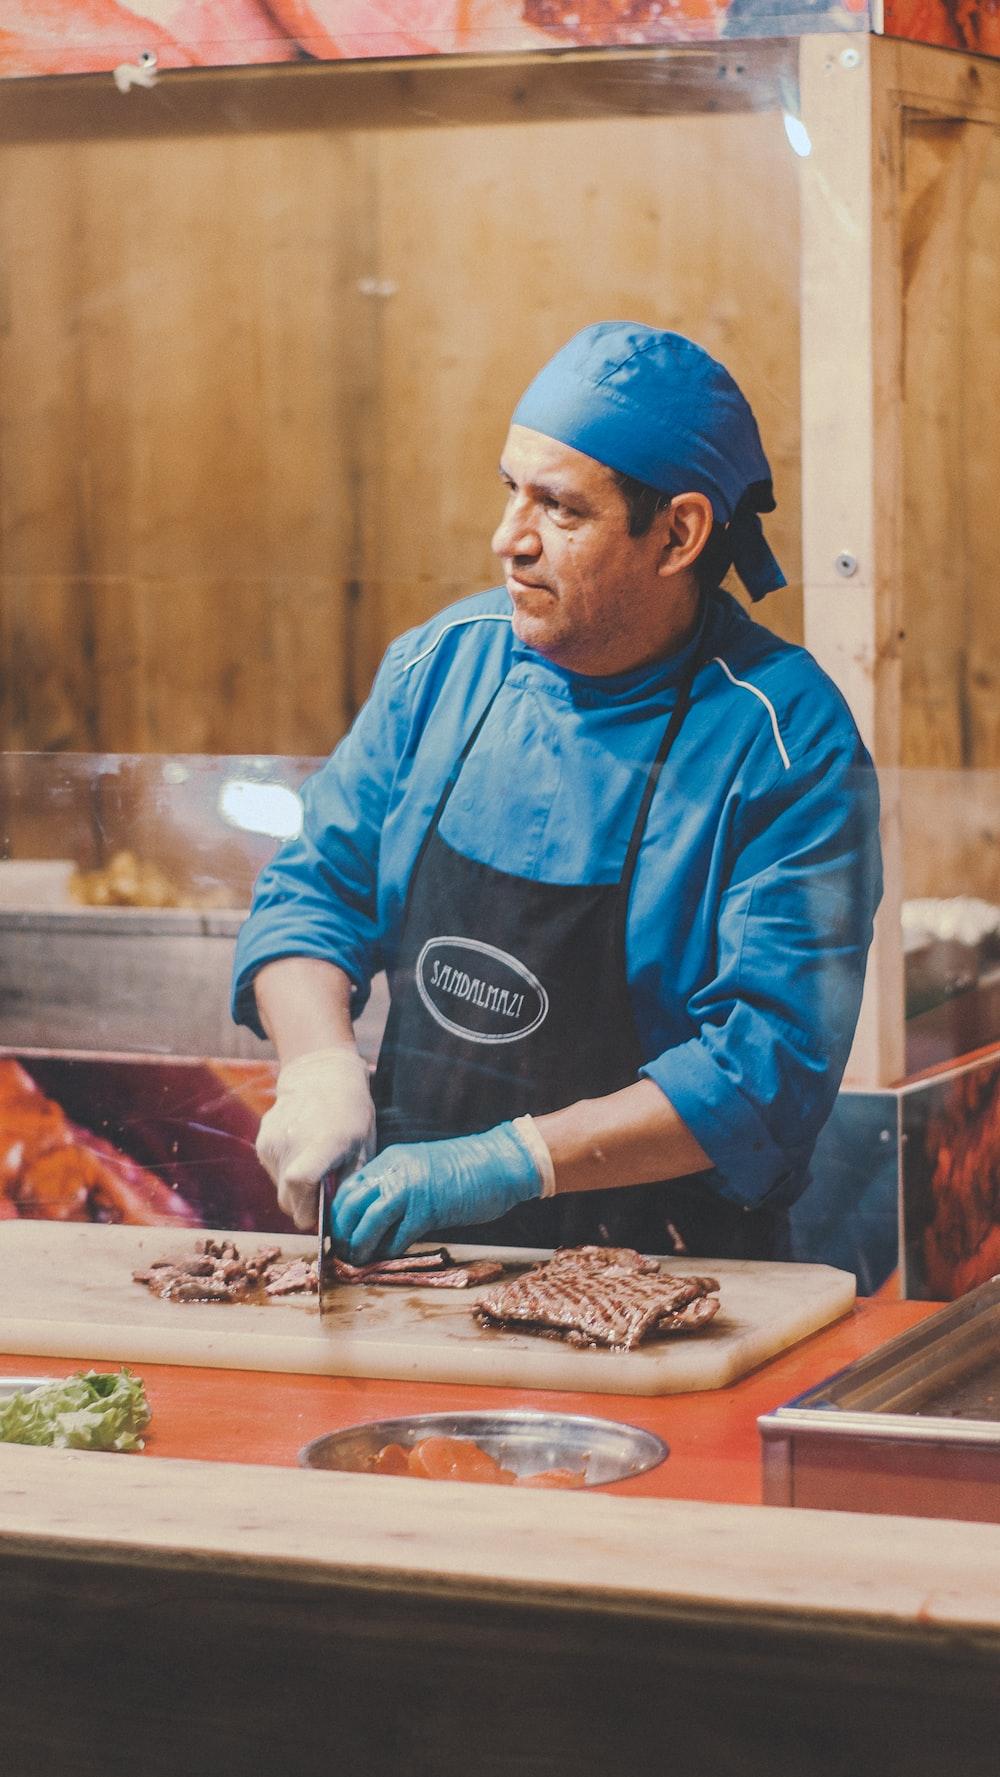 man wearing apron chopping meat